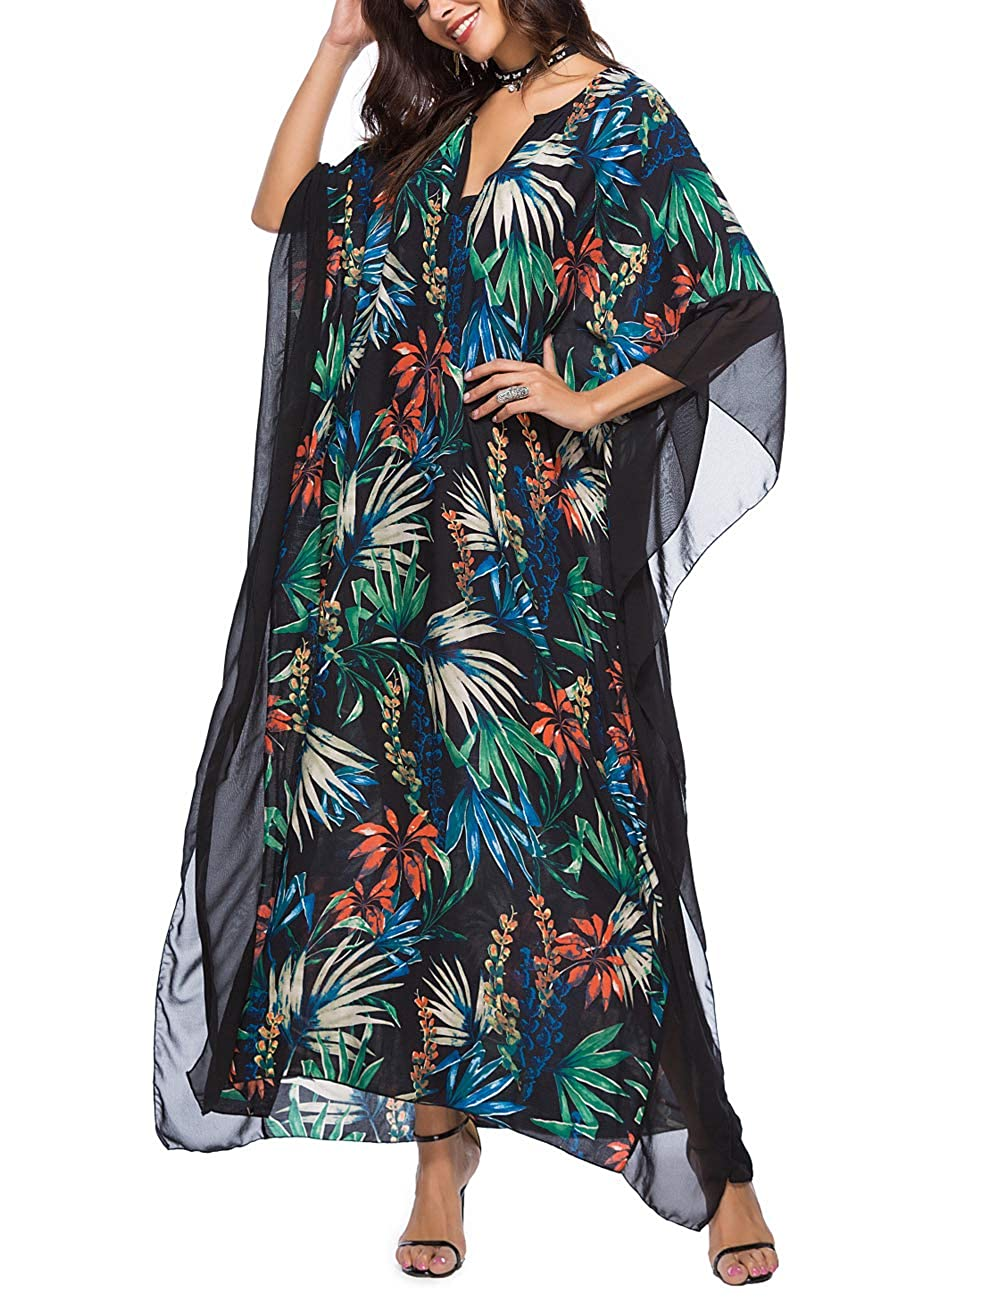 Caftan Dresses for Women Summer Maxi V Neck Boho Floral Beach Cover Up Plus Size Loose Casual Kaftan